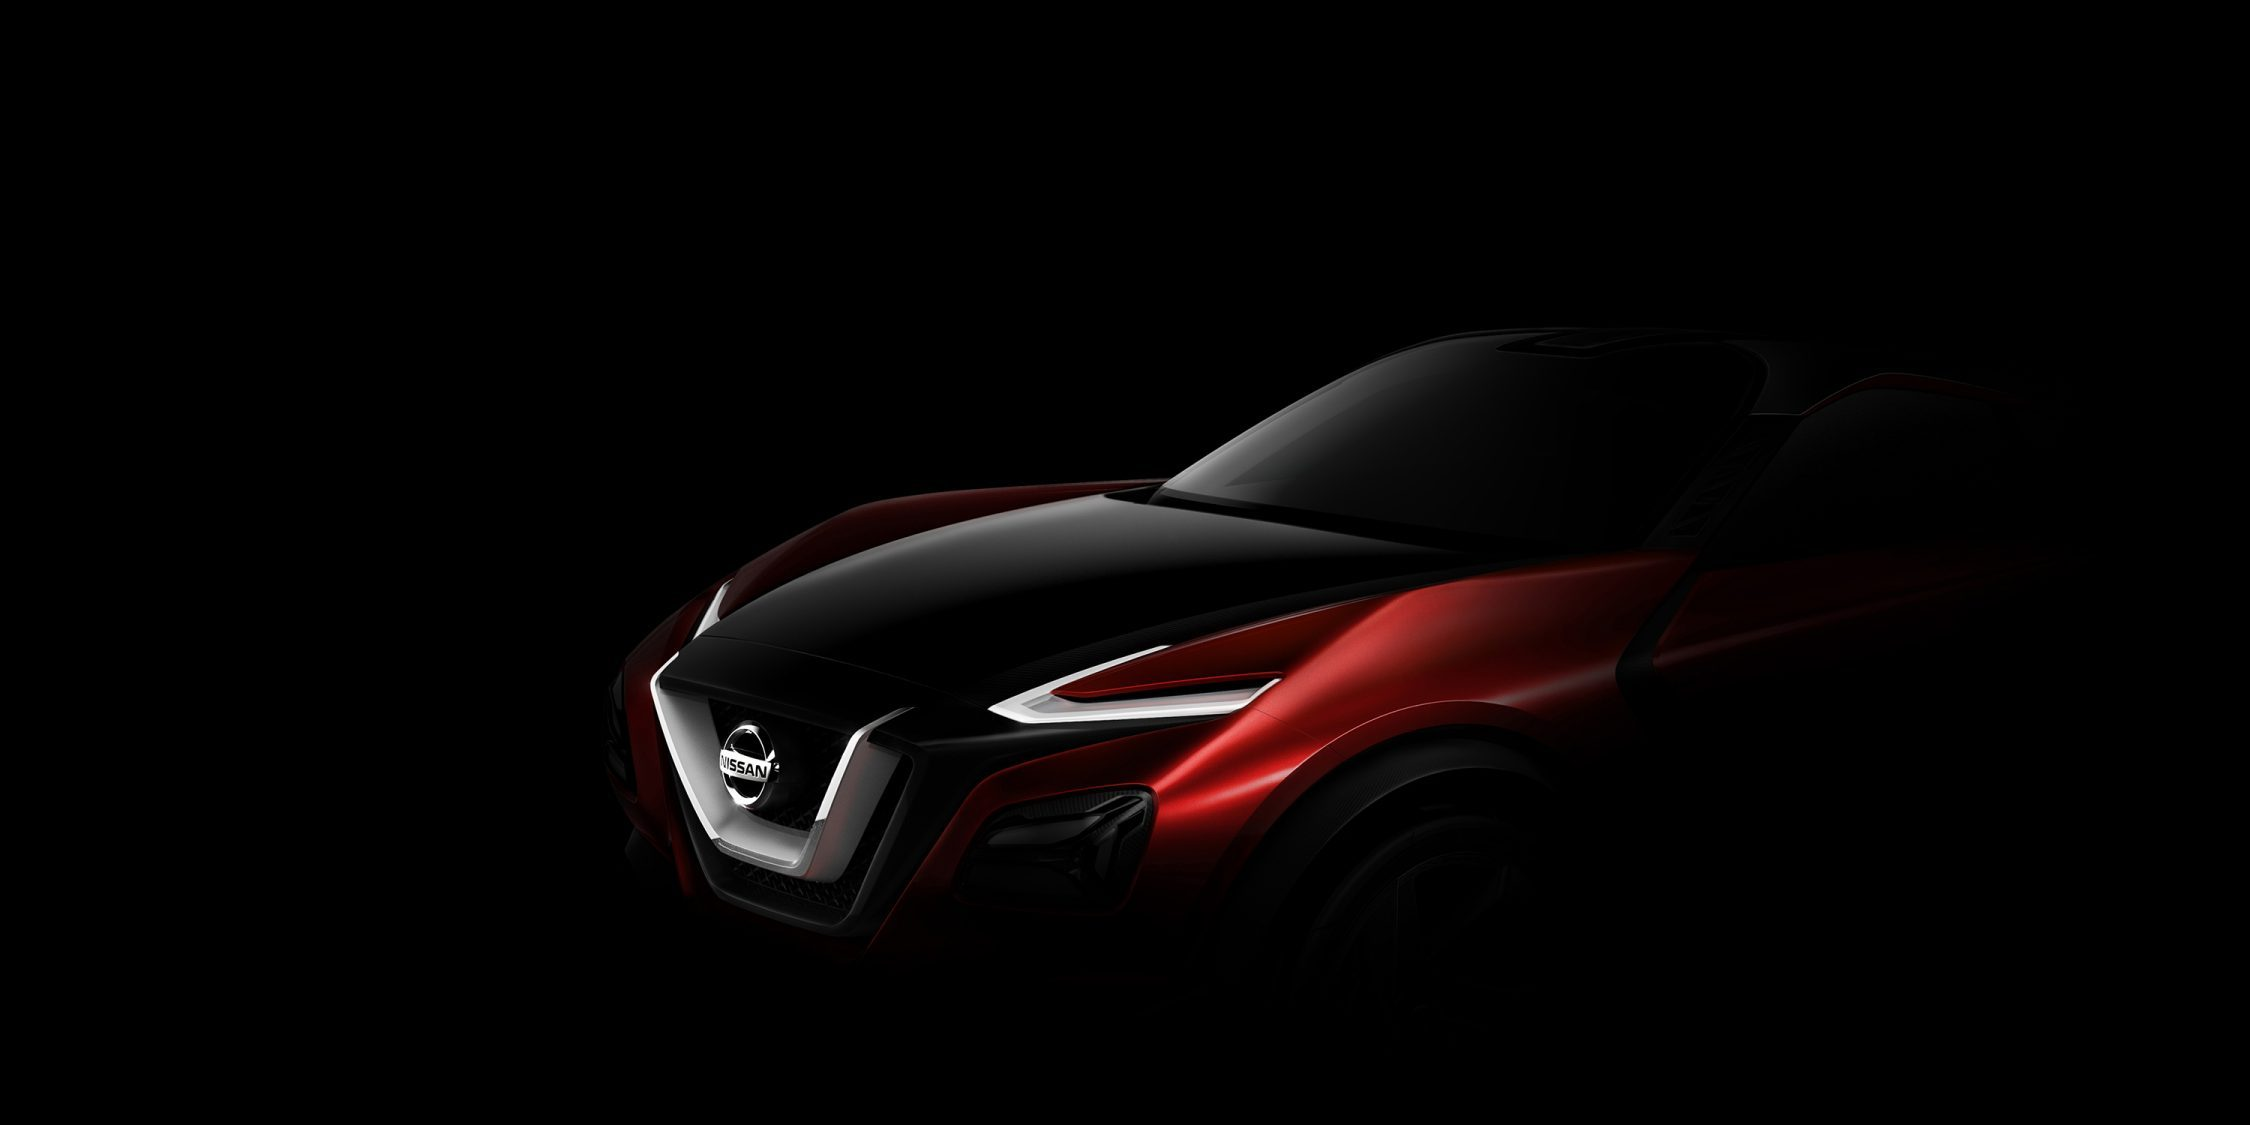 2020 Nissan Z400 - Nissan Cars Review Release Raiacars.com